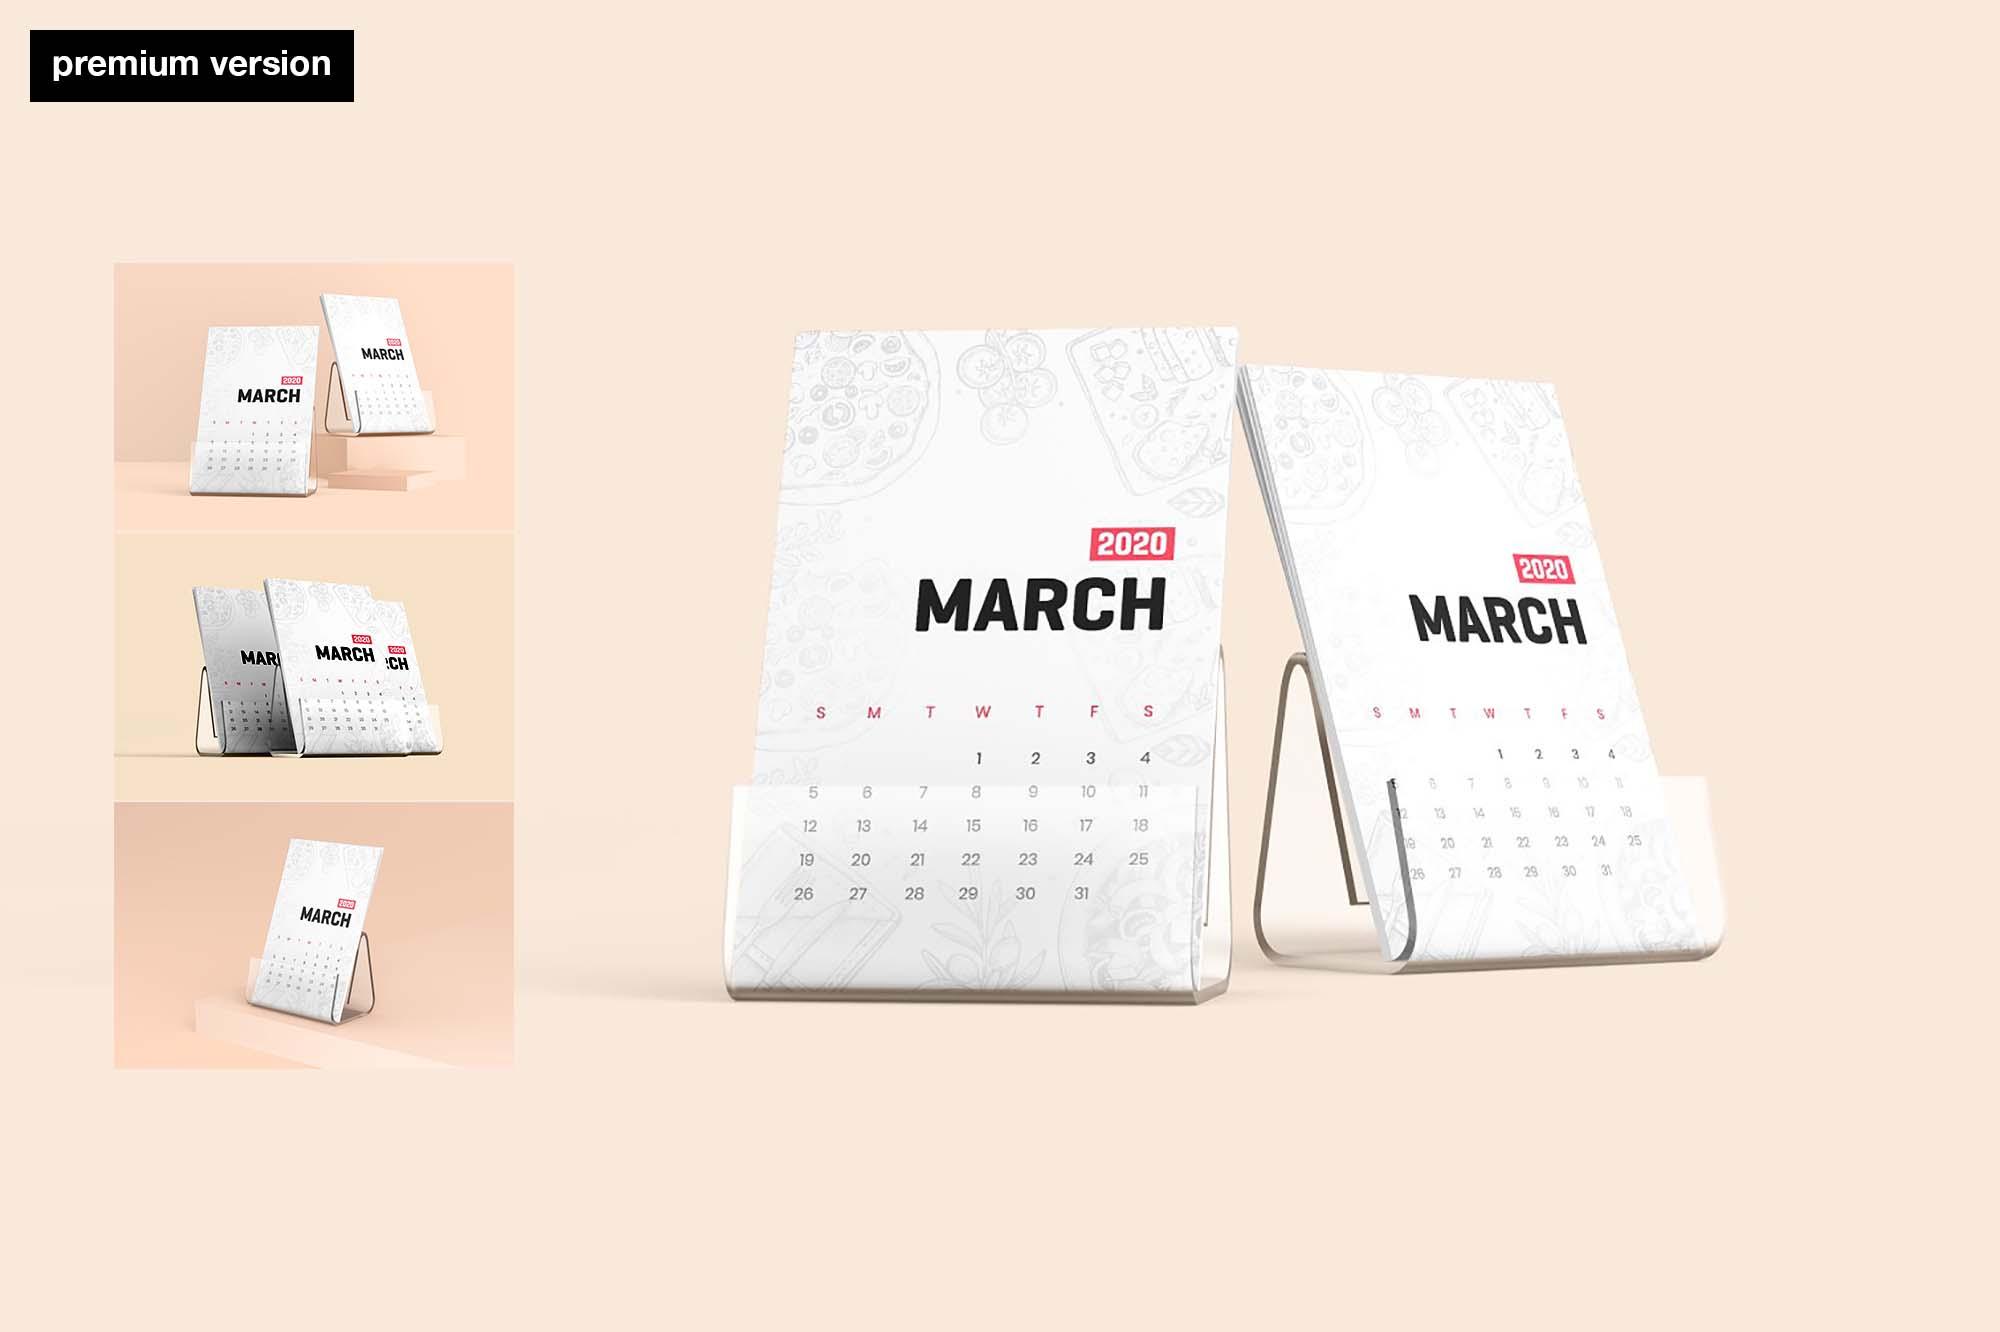 Desk Calendar With Stand Mockup - Premium